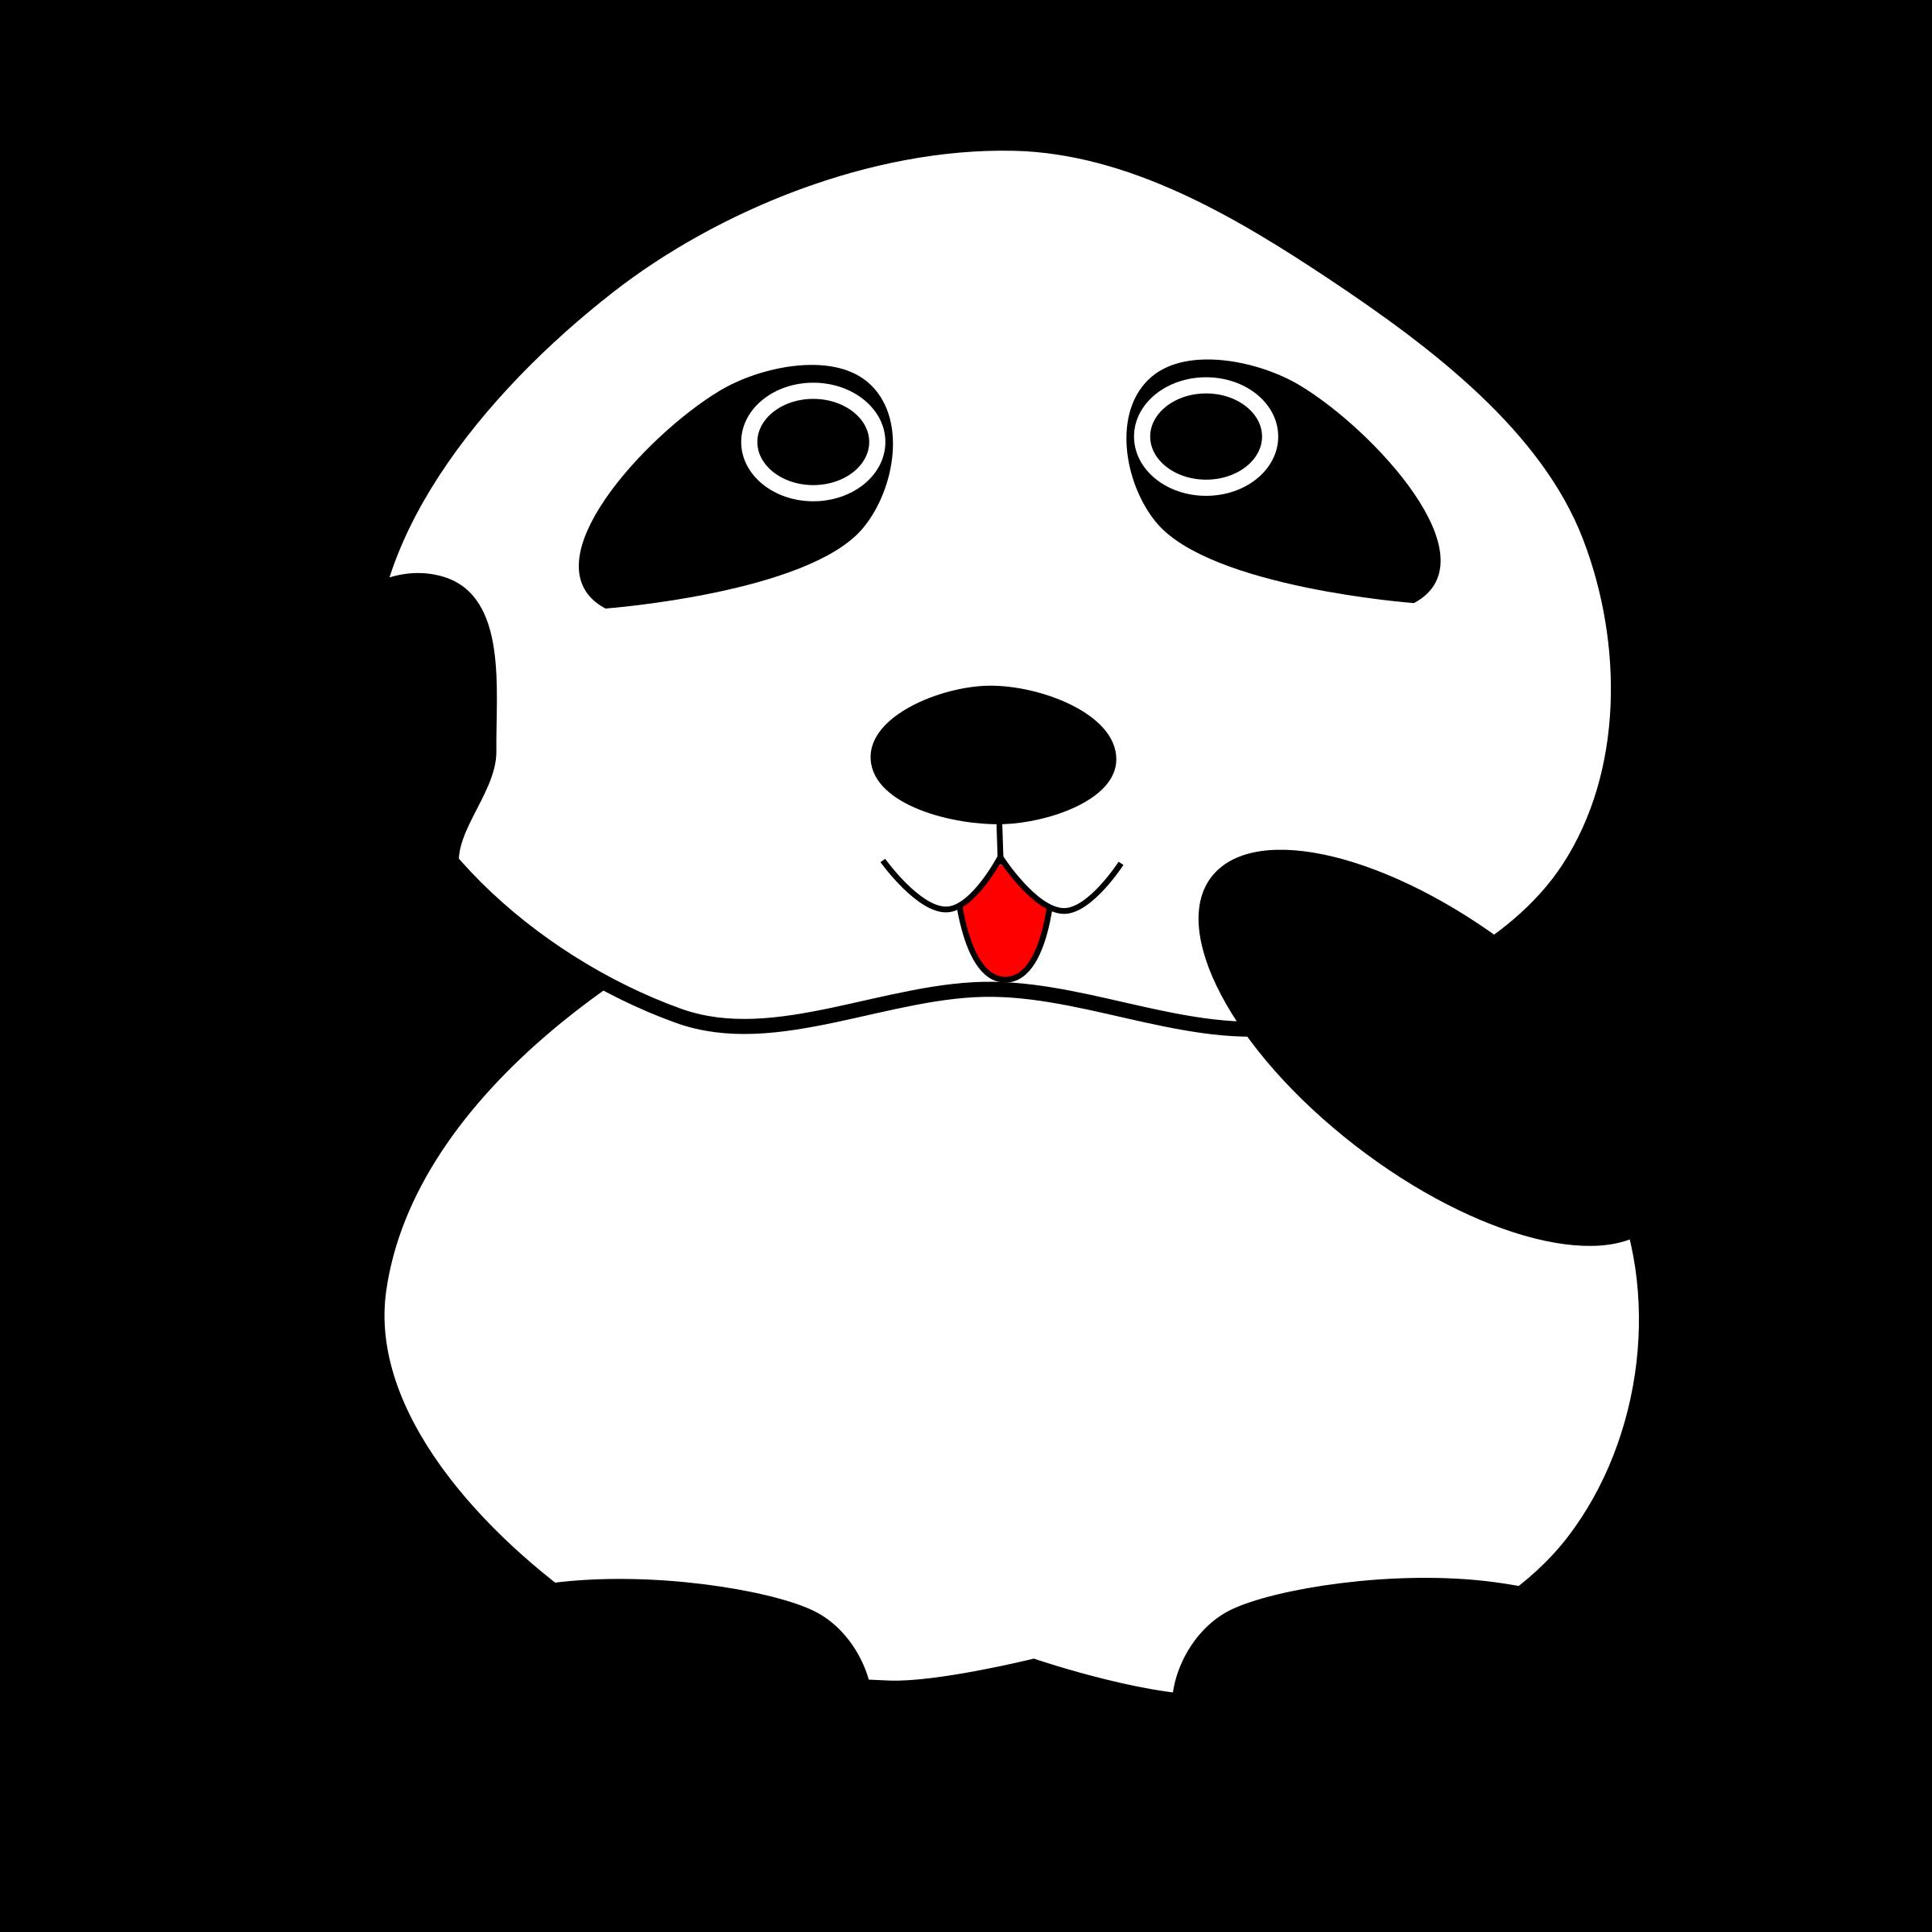 Big image png. Clipart panda mammal